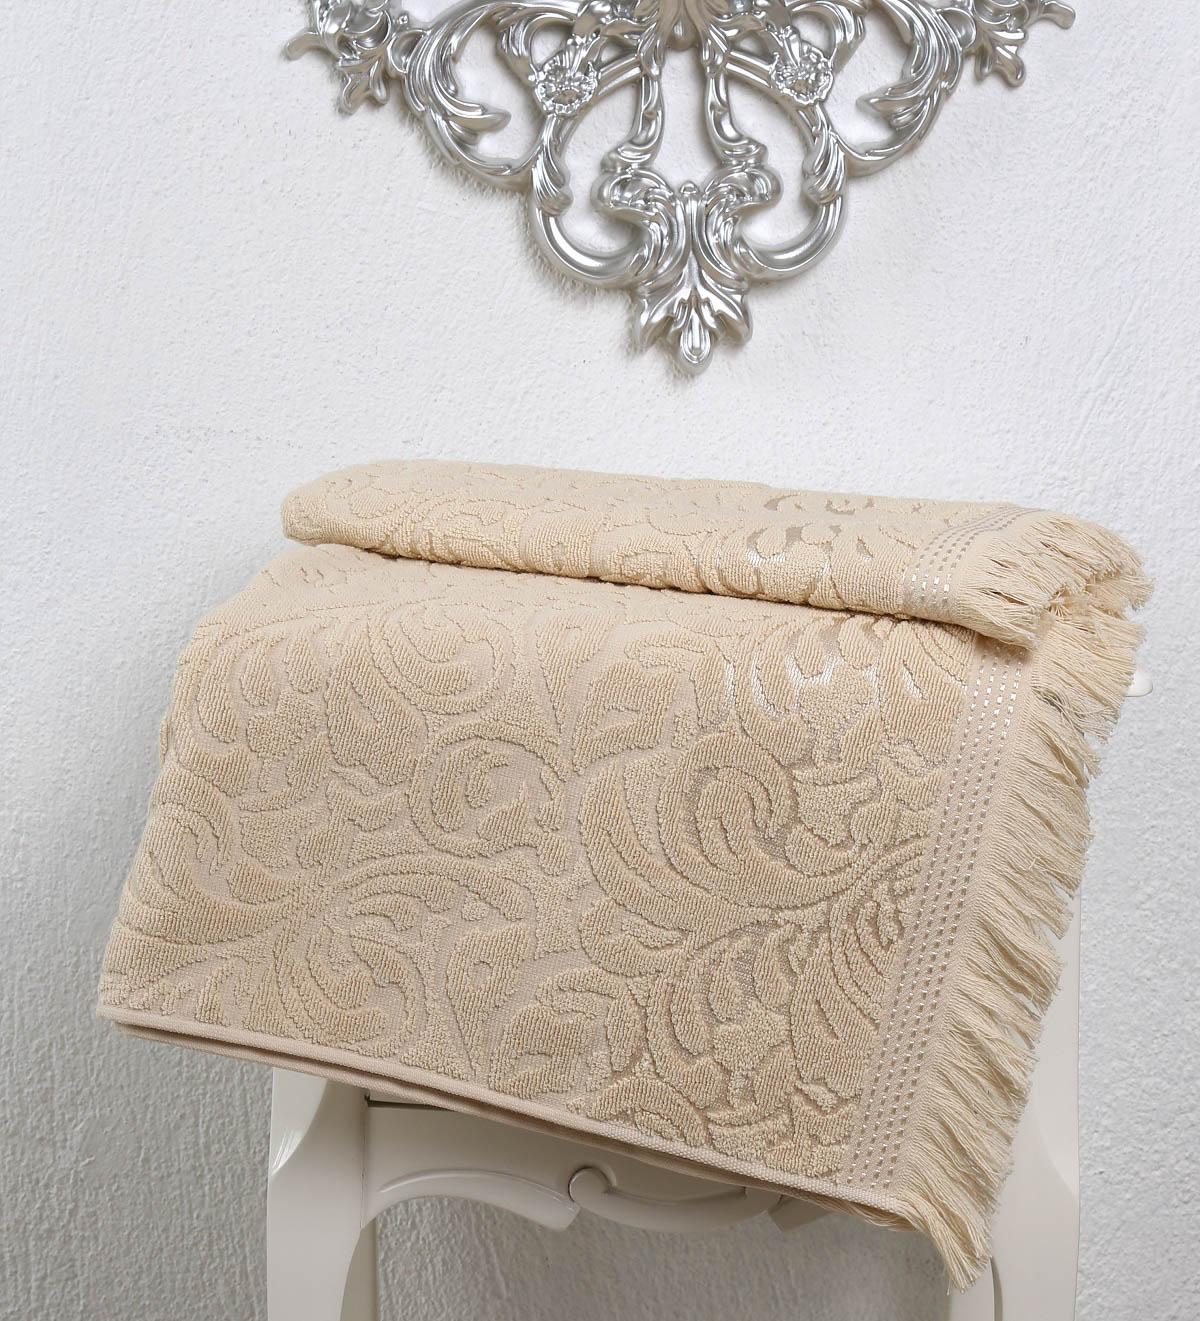 Полотенца Karna Полотенце Esra Цвет: Бежевый (70х140 см) karna karna полотенце innes цвет красный 70х140 см